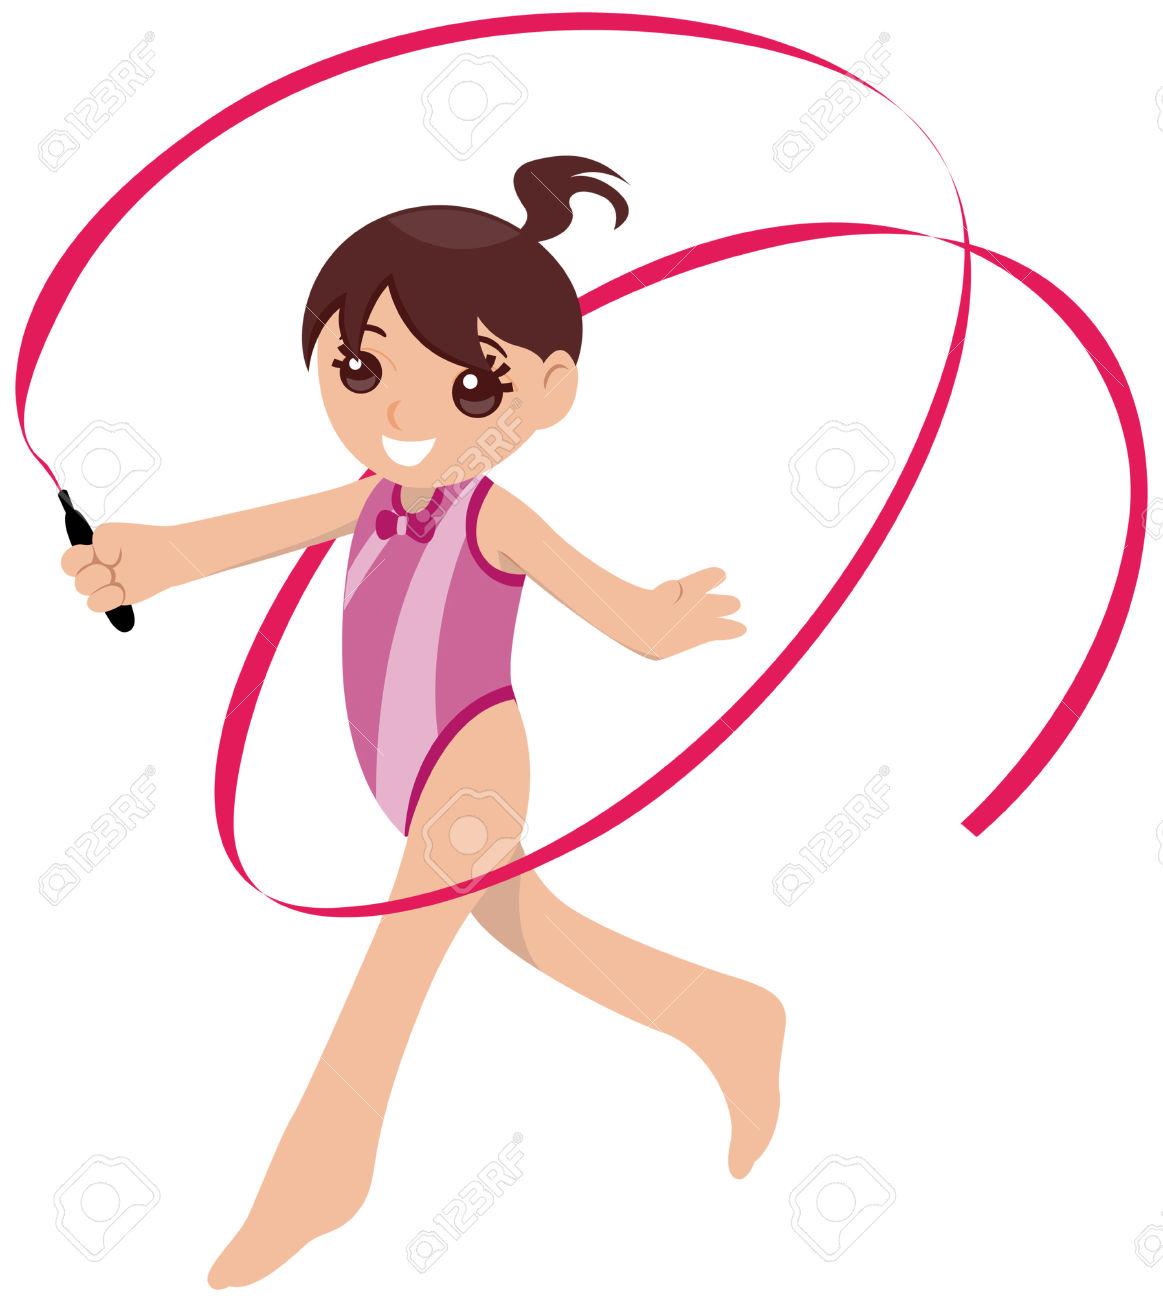 Children gymnastics clipart jpg stock Gymnastics Cartoon Clipart | Free download best Gymnastics Cartoon ... jpg stock